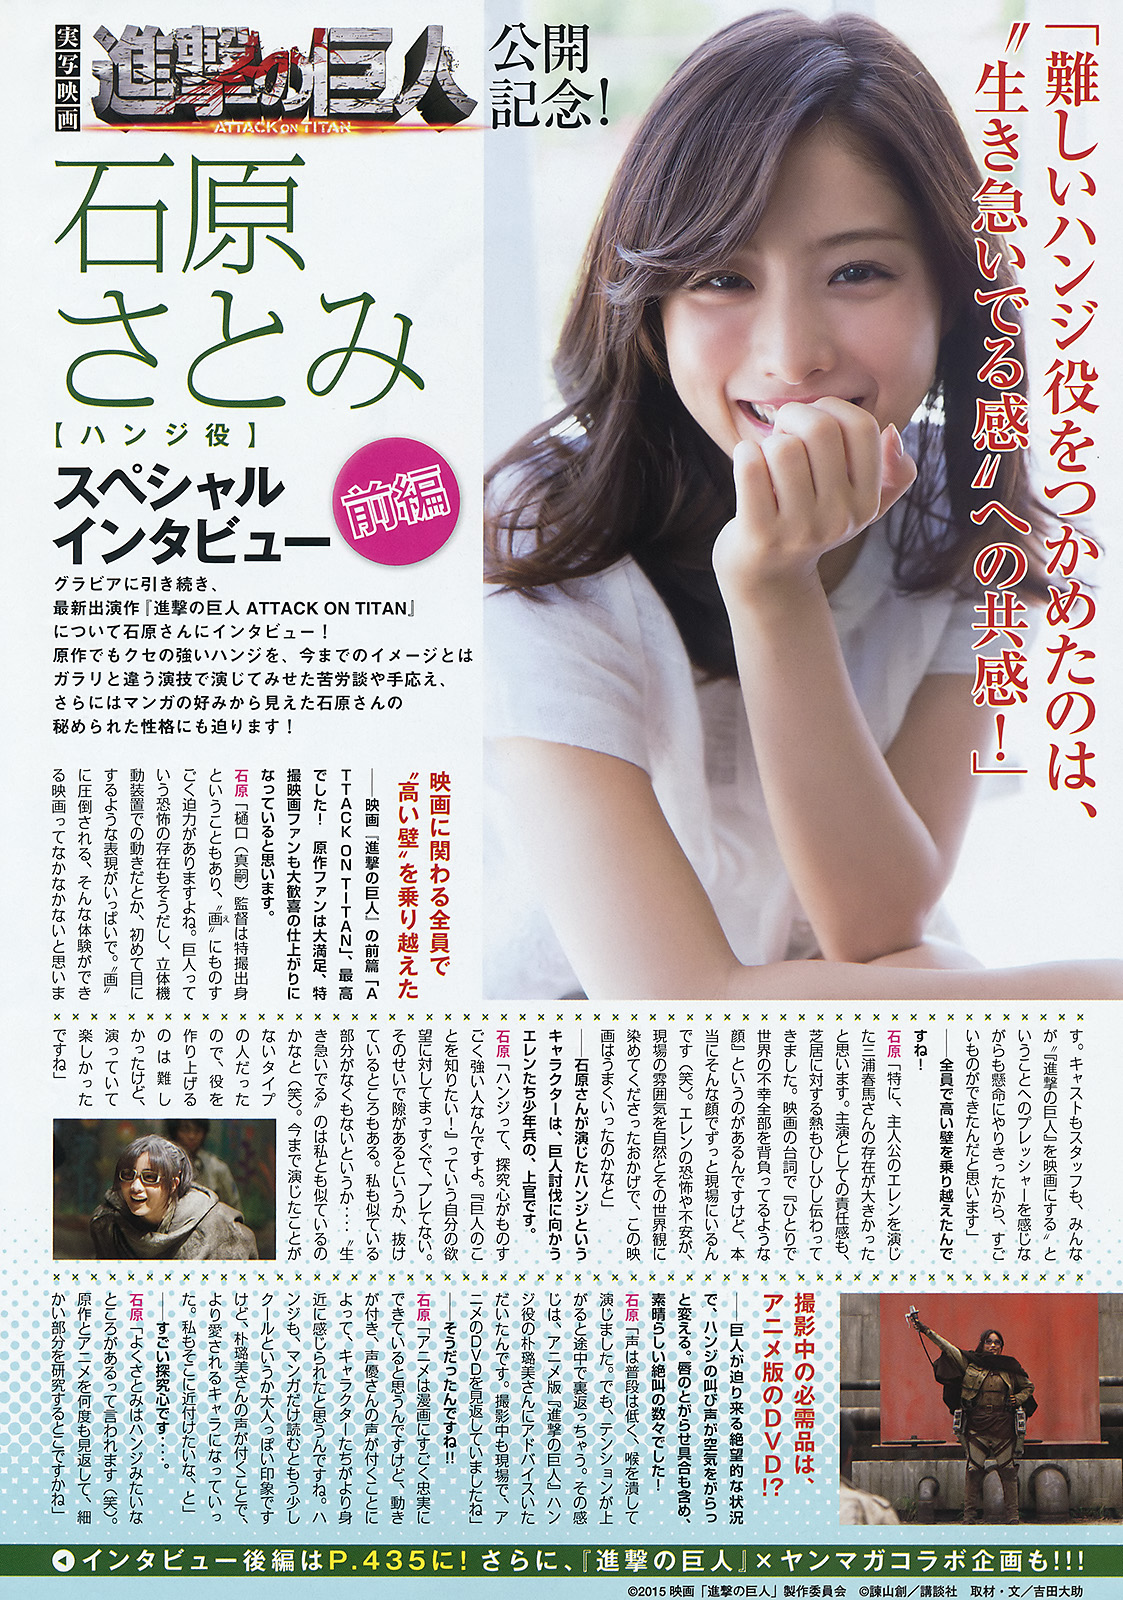 http://upimg.tokimeki-s.com/2015/08/55ca2287b0ba9.jpg